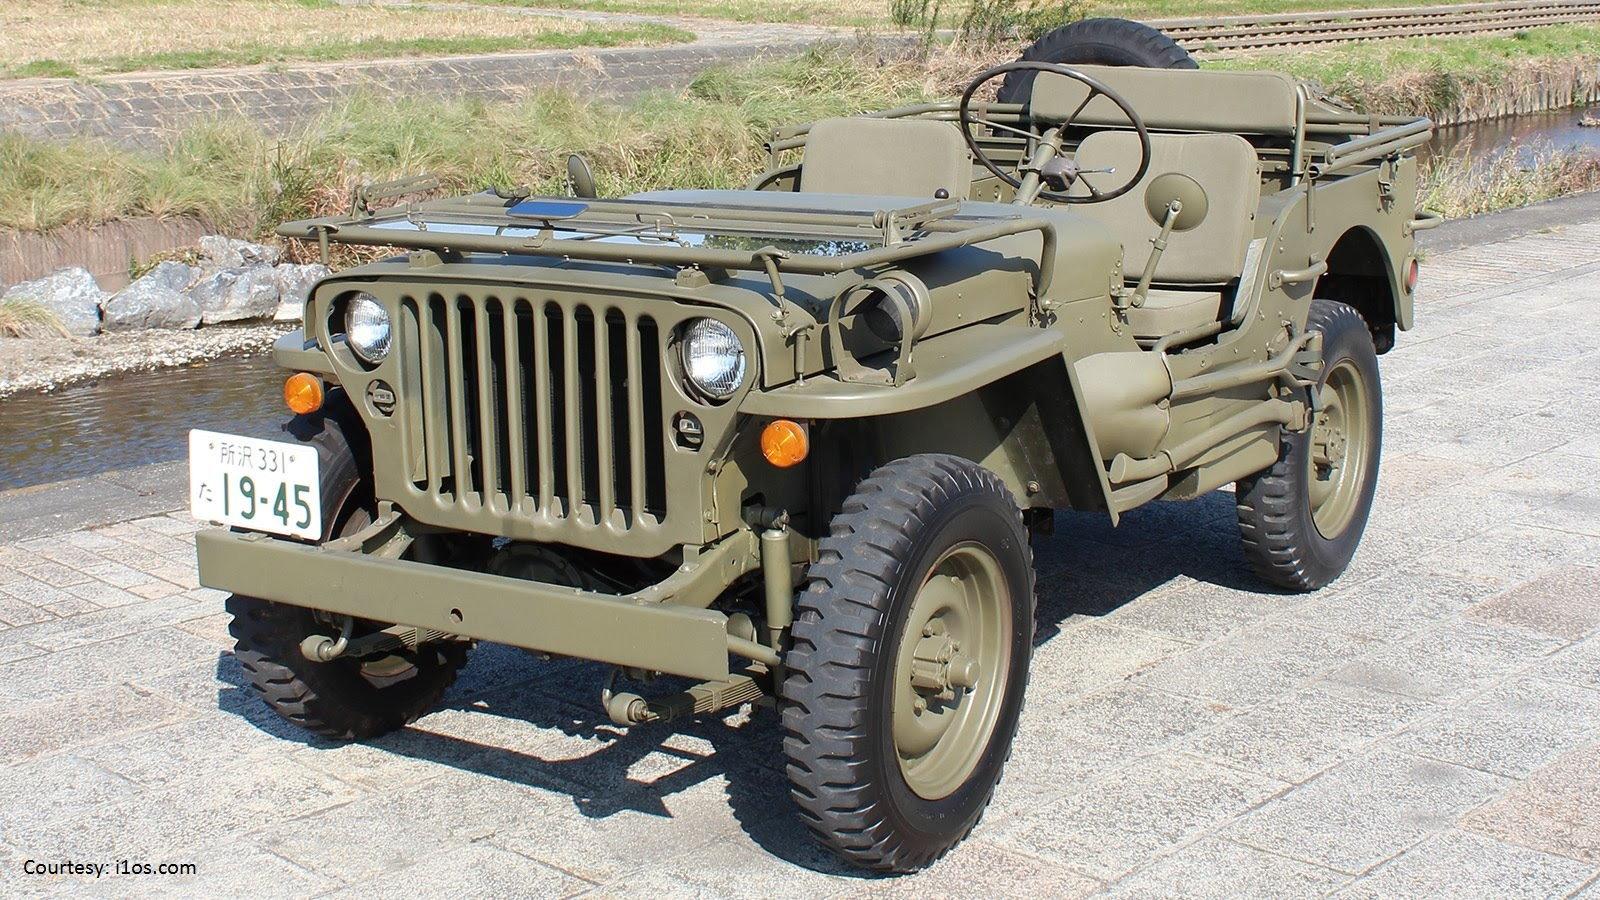 The military Jeep had an unprecedented run